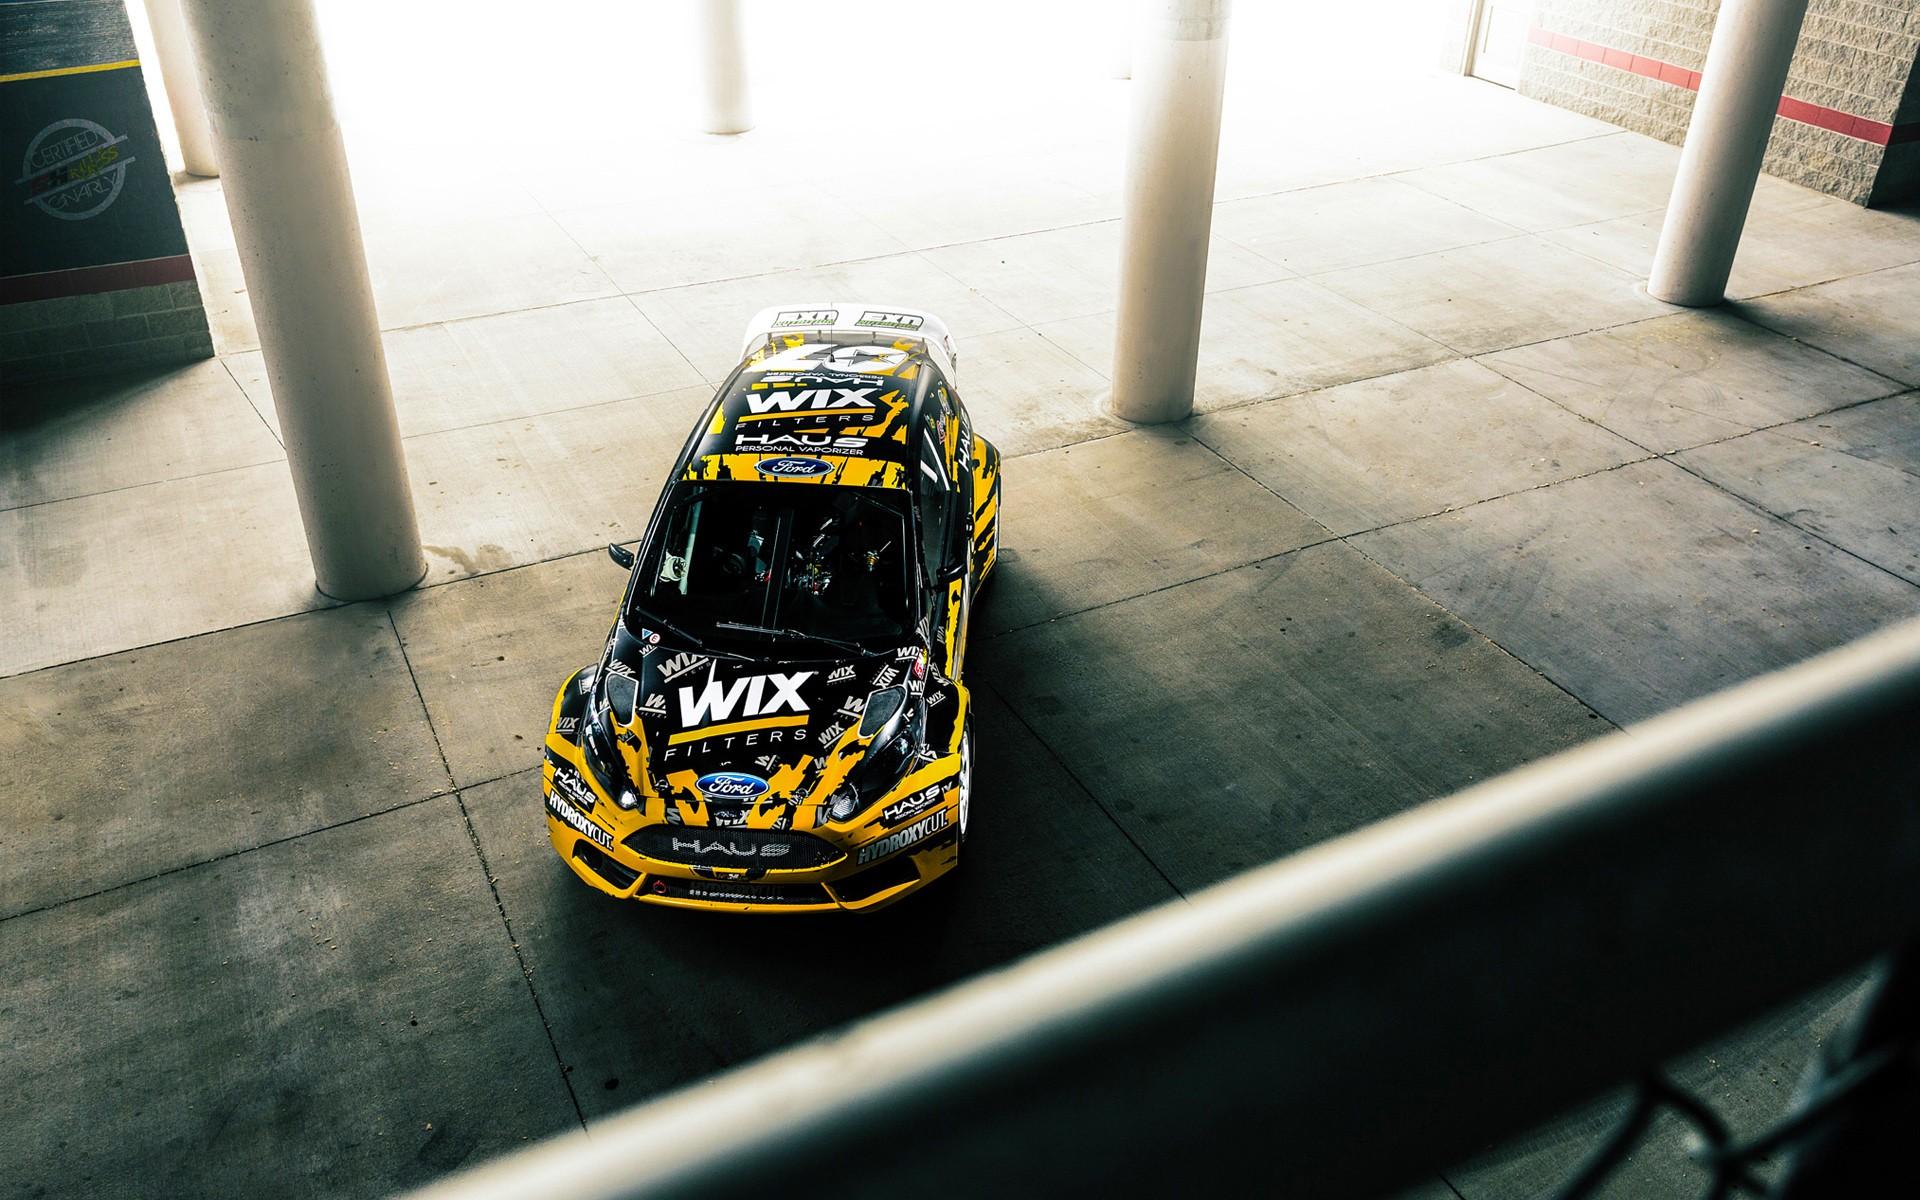 2015 Ford Fiesta Rally Car Wallpaper | HD Car Wallpapers ...